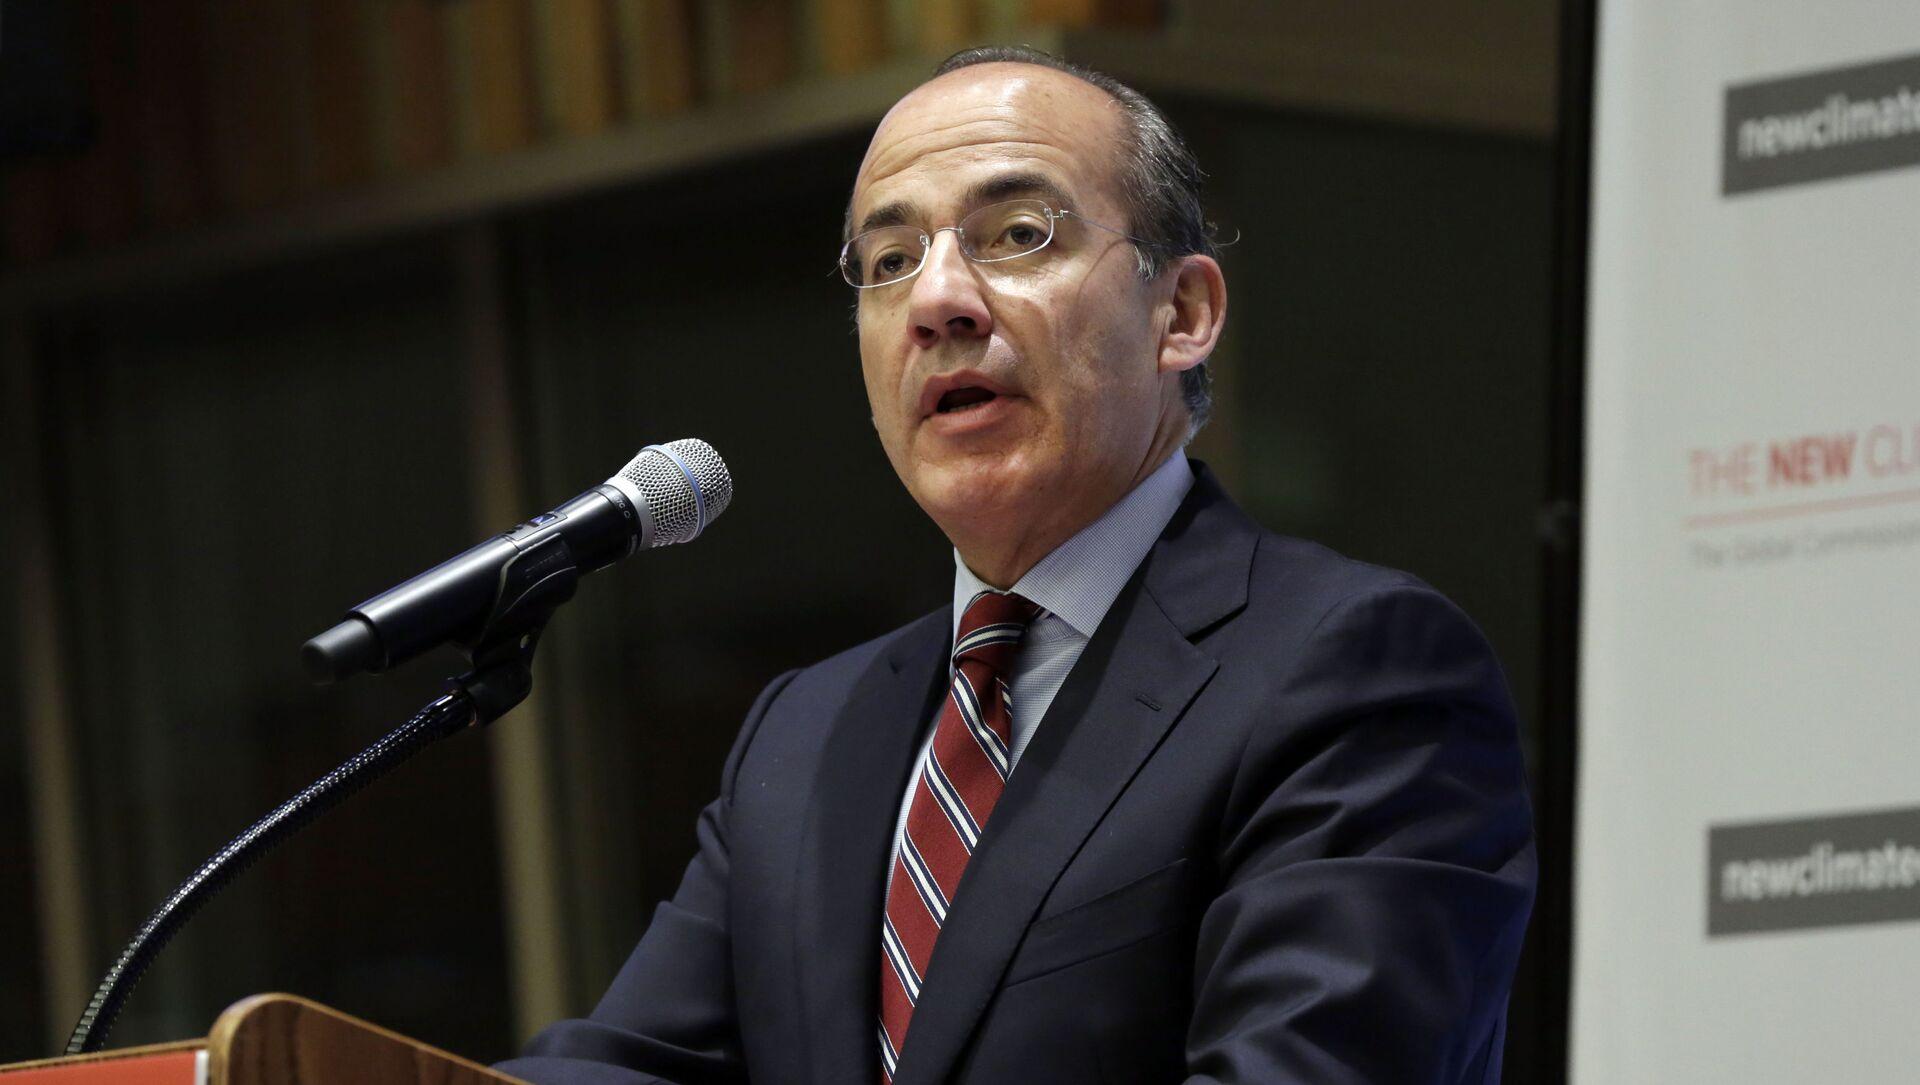 El expresidente de México Felipe Calderón - Sputnik Mundo, 1920, 27.01.2021